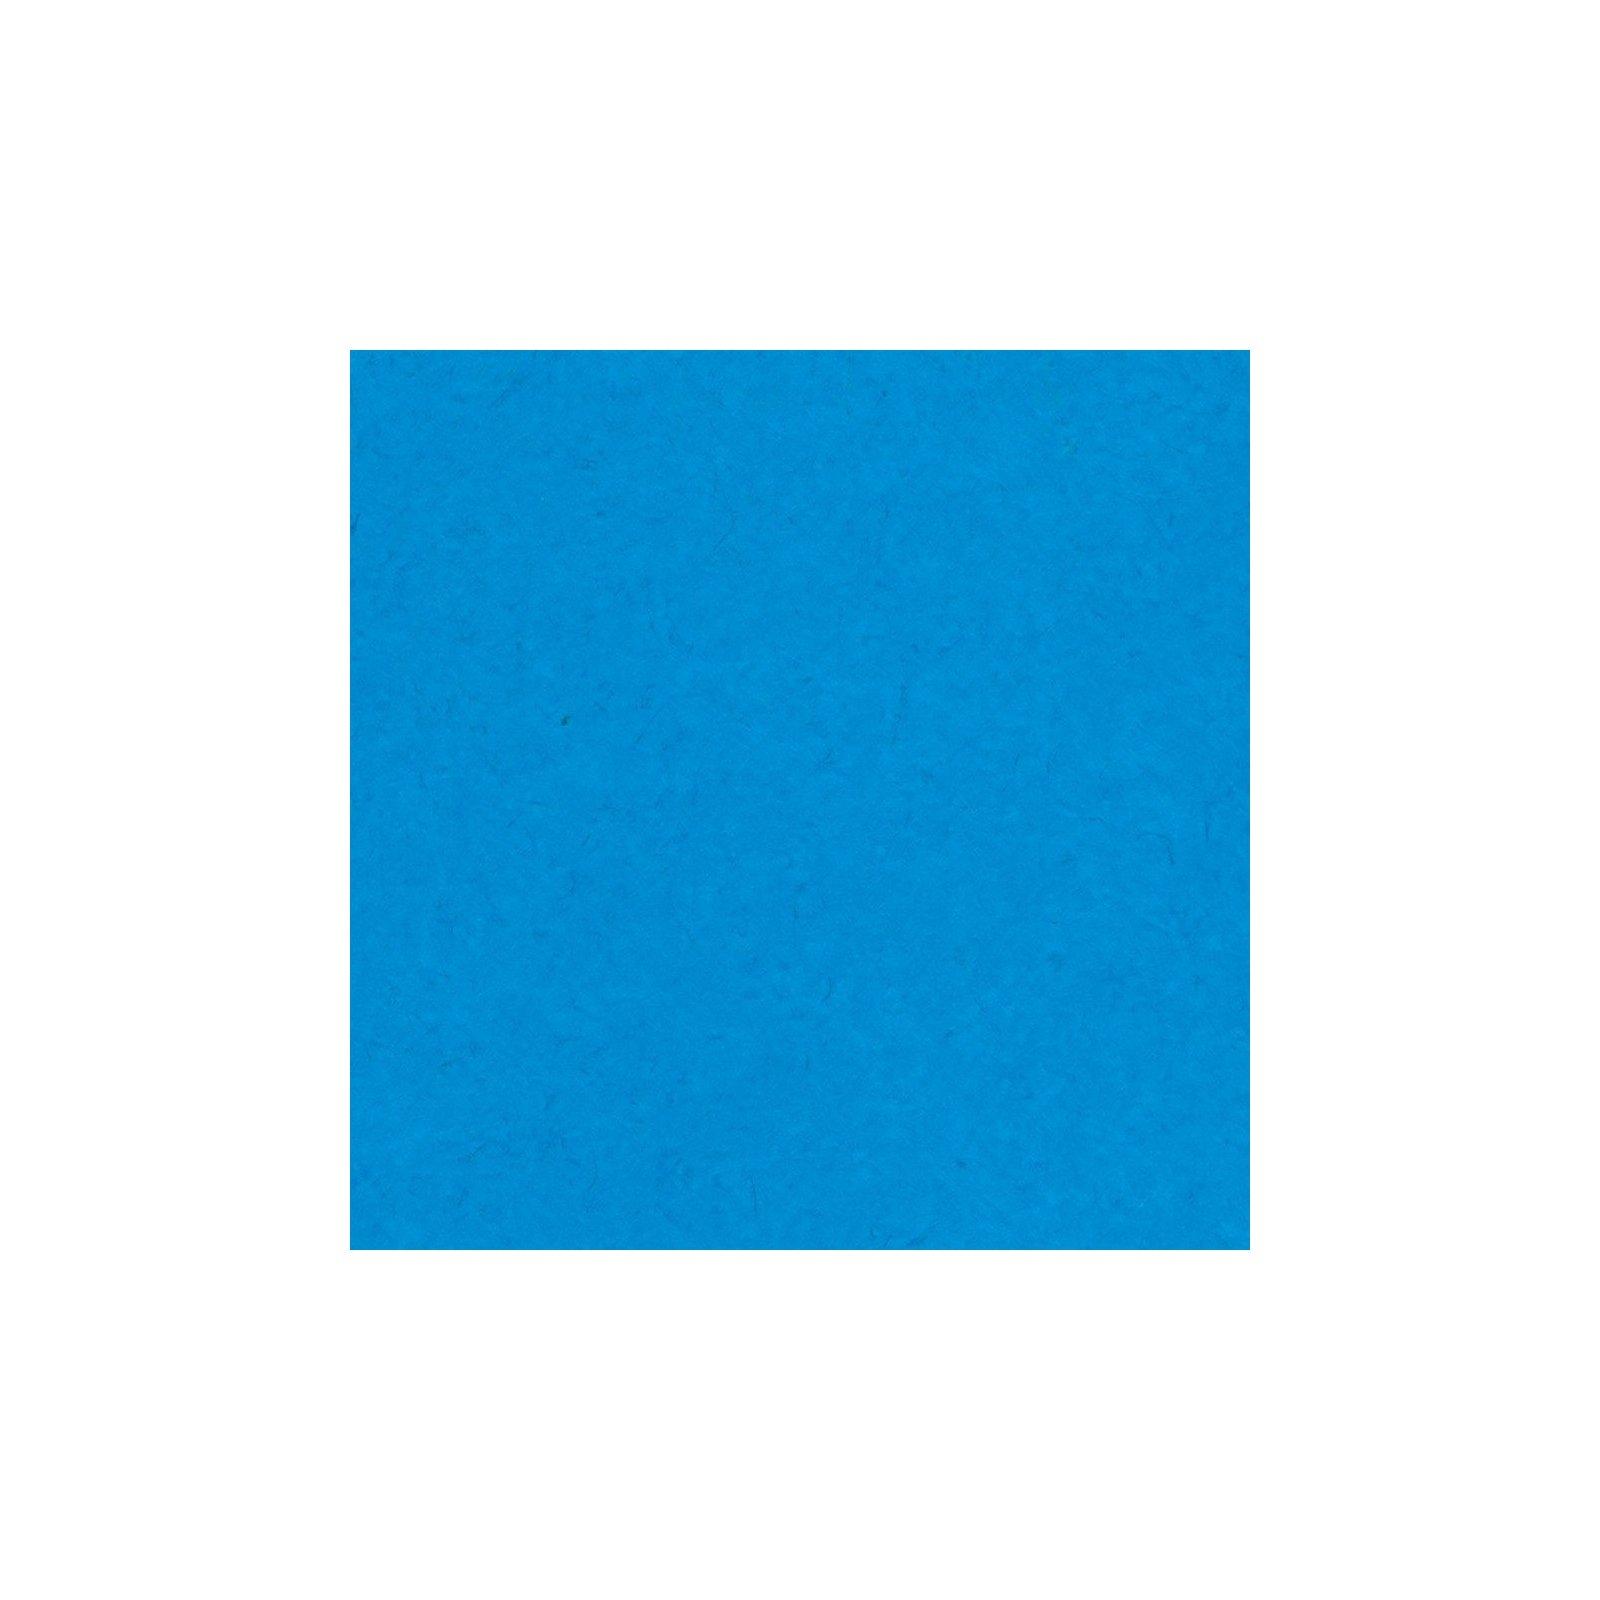 Papier bleu fluo - Blue raspberry - Framboise bleue - Smoothies - Bazzill Basics Paper